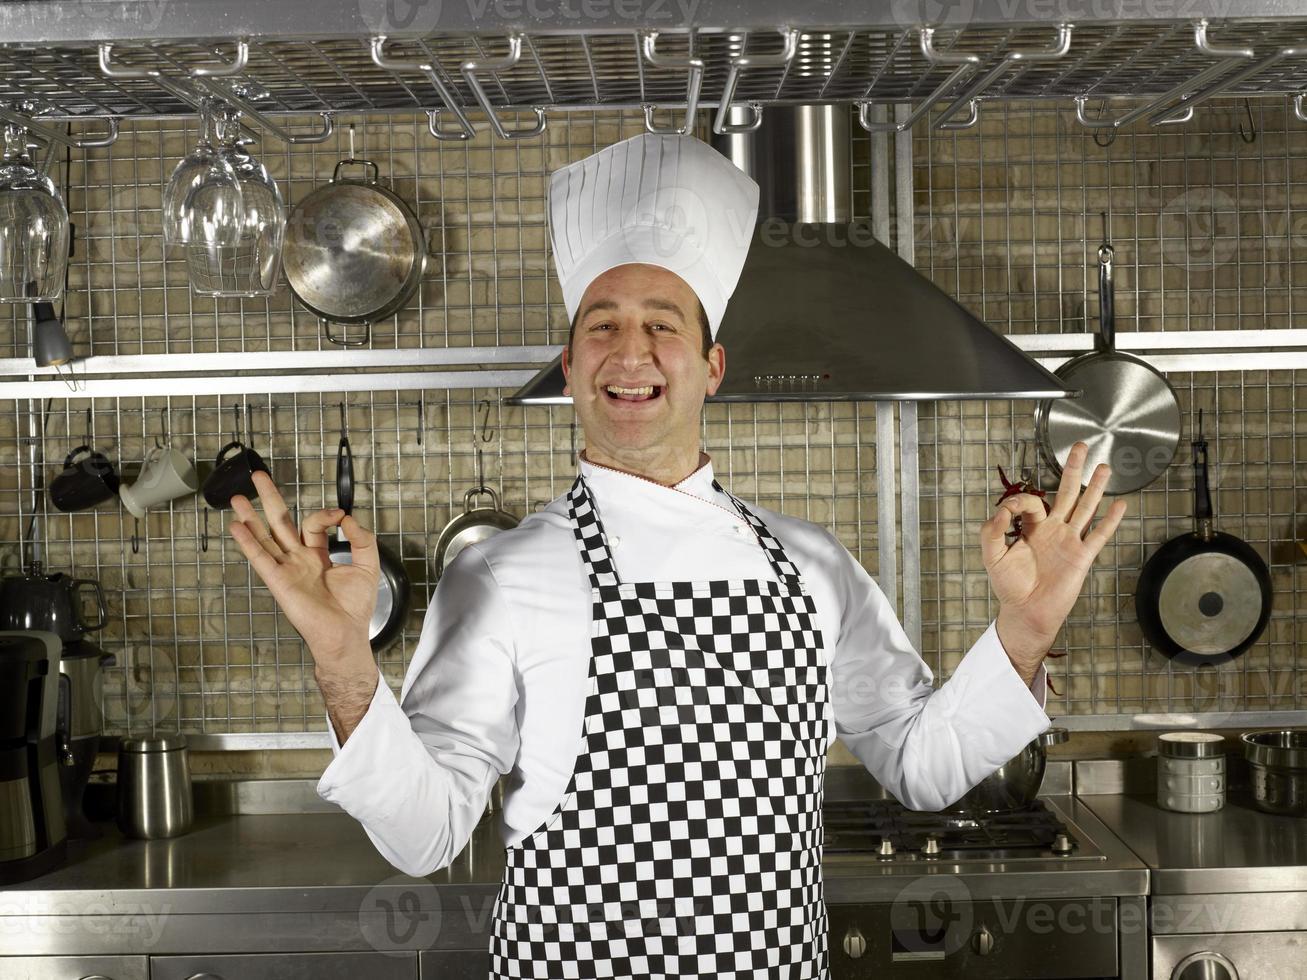 Chef Portrait photo